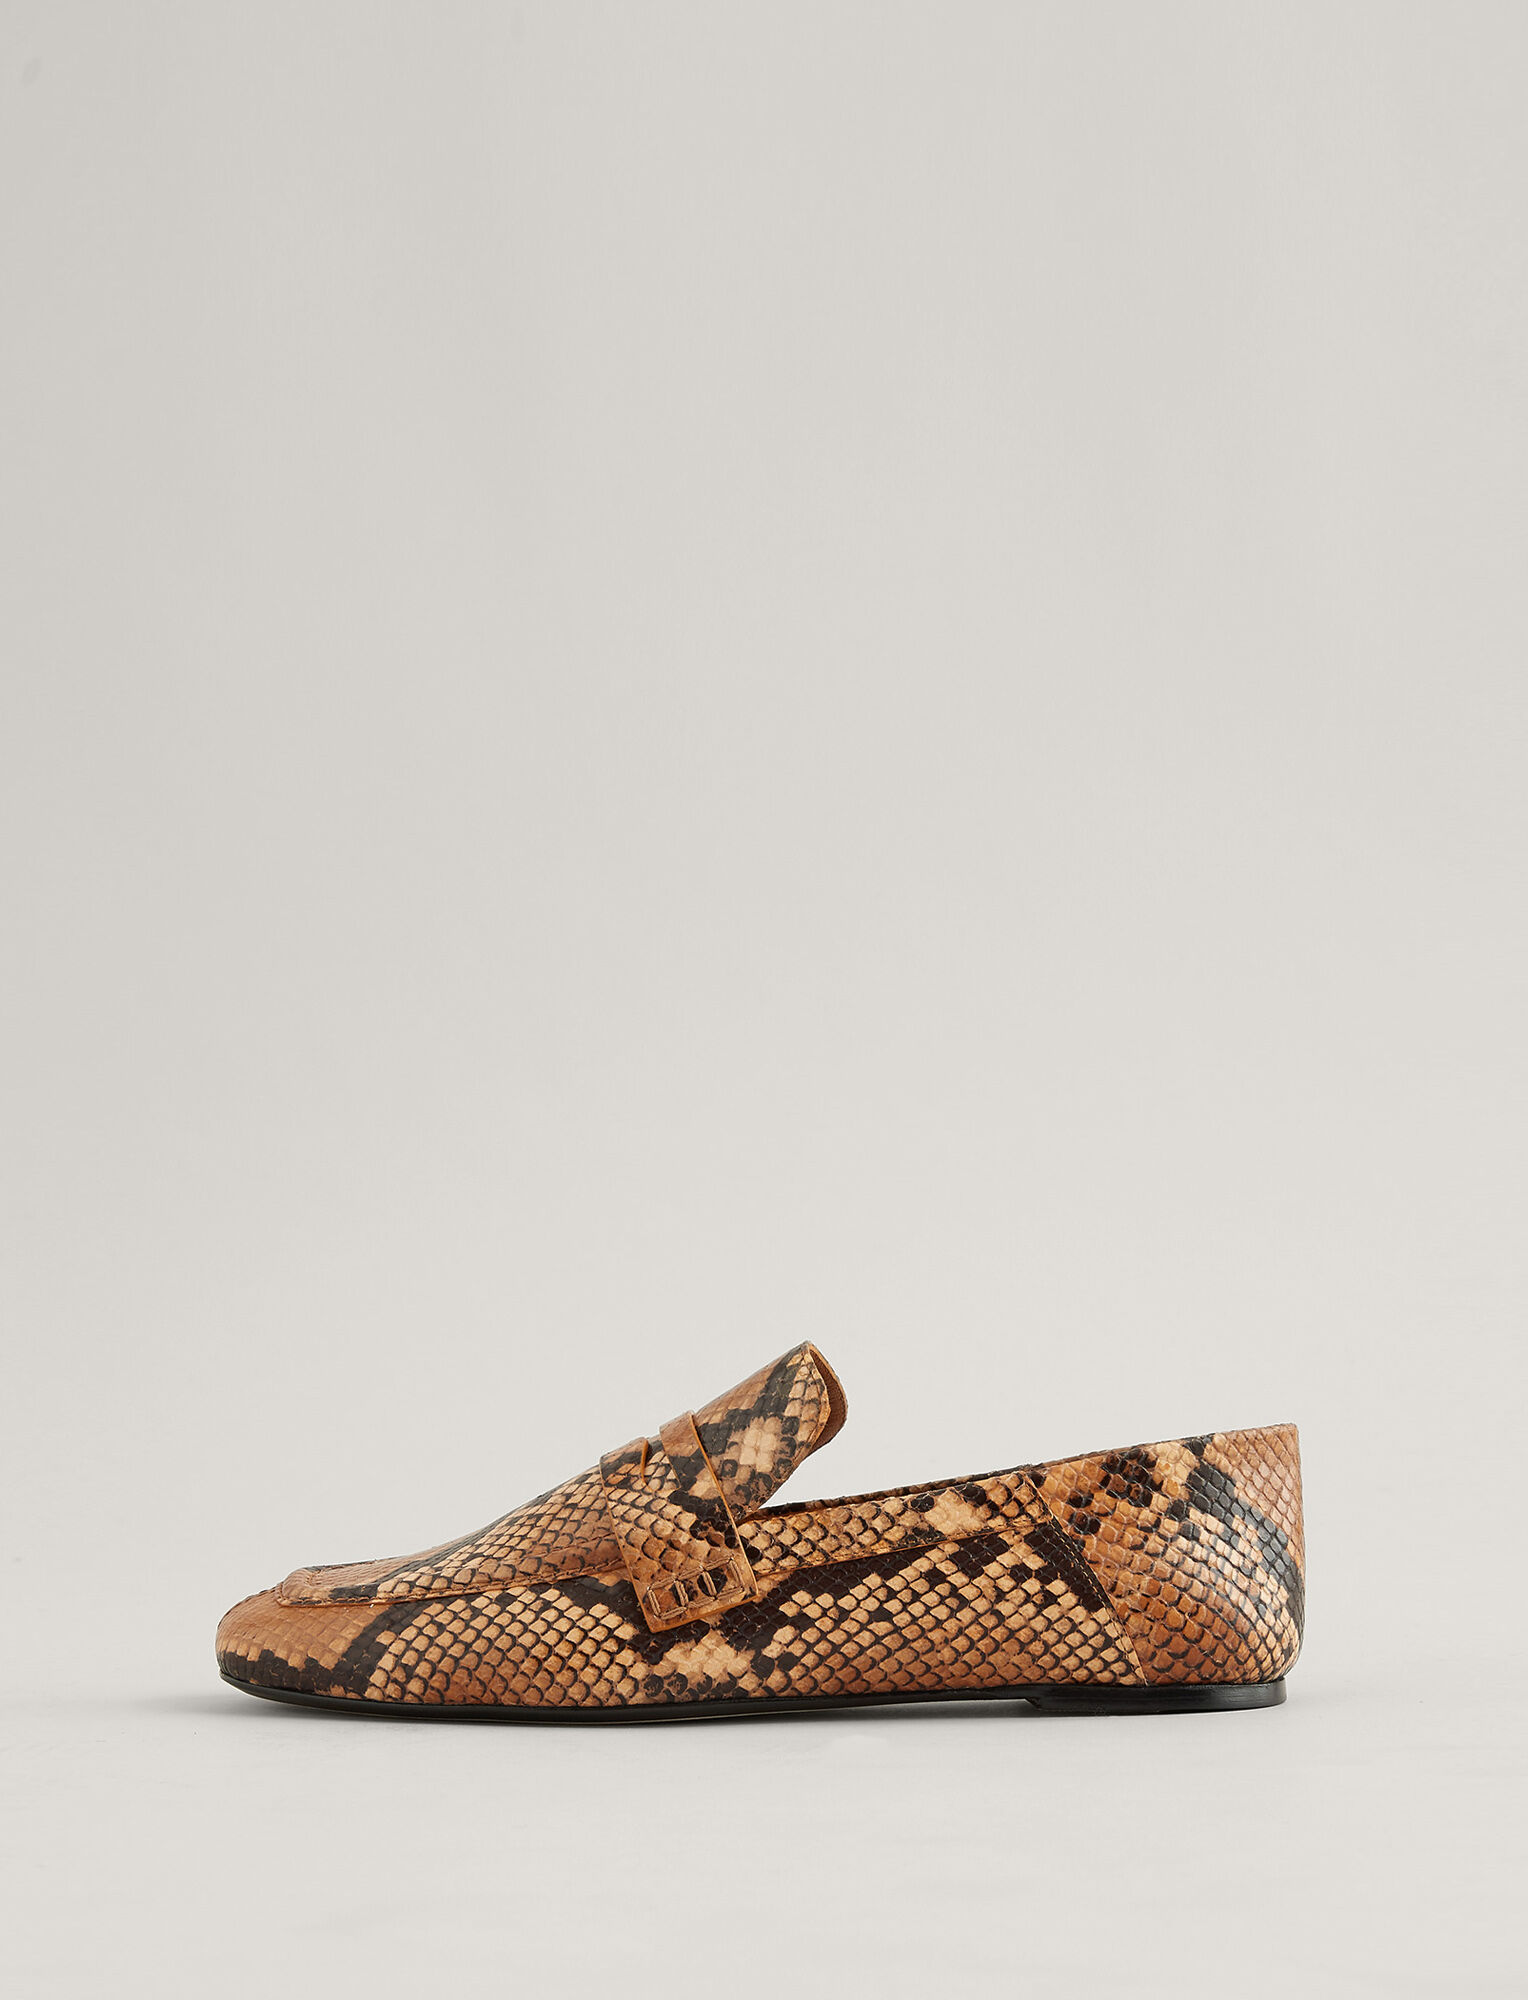 Joseph, Bakhta Leather Loafer, in CARAMEL/GREY